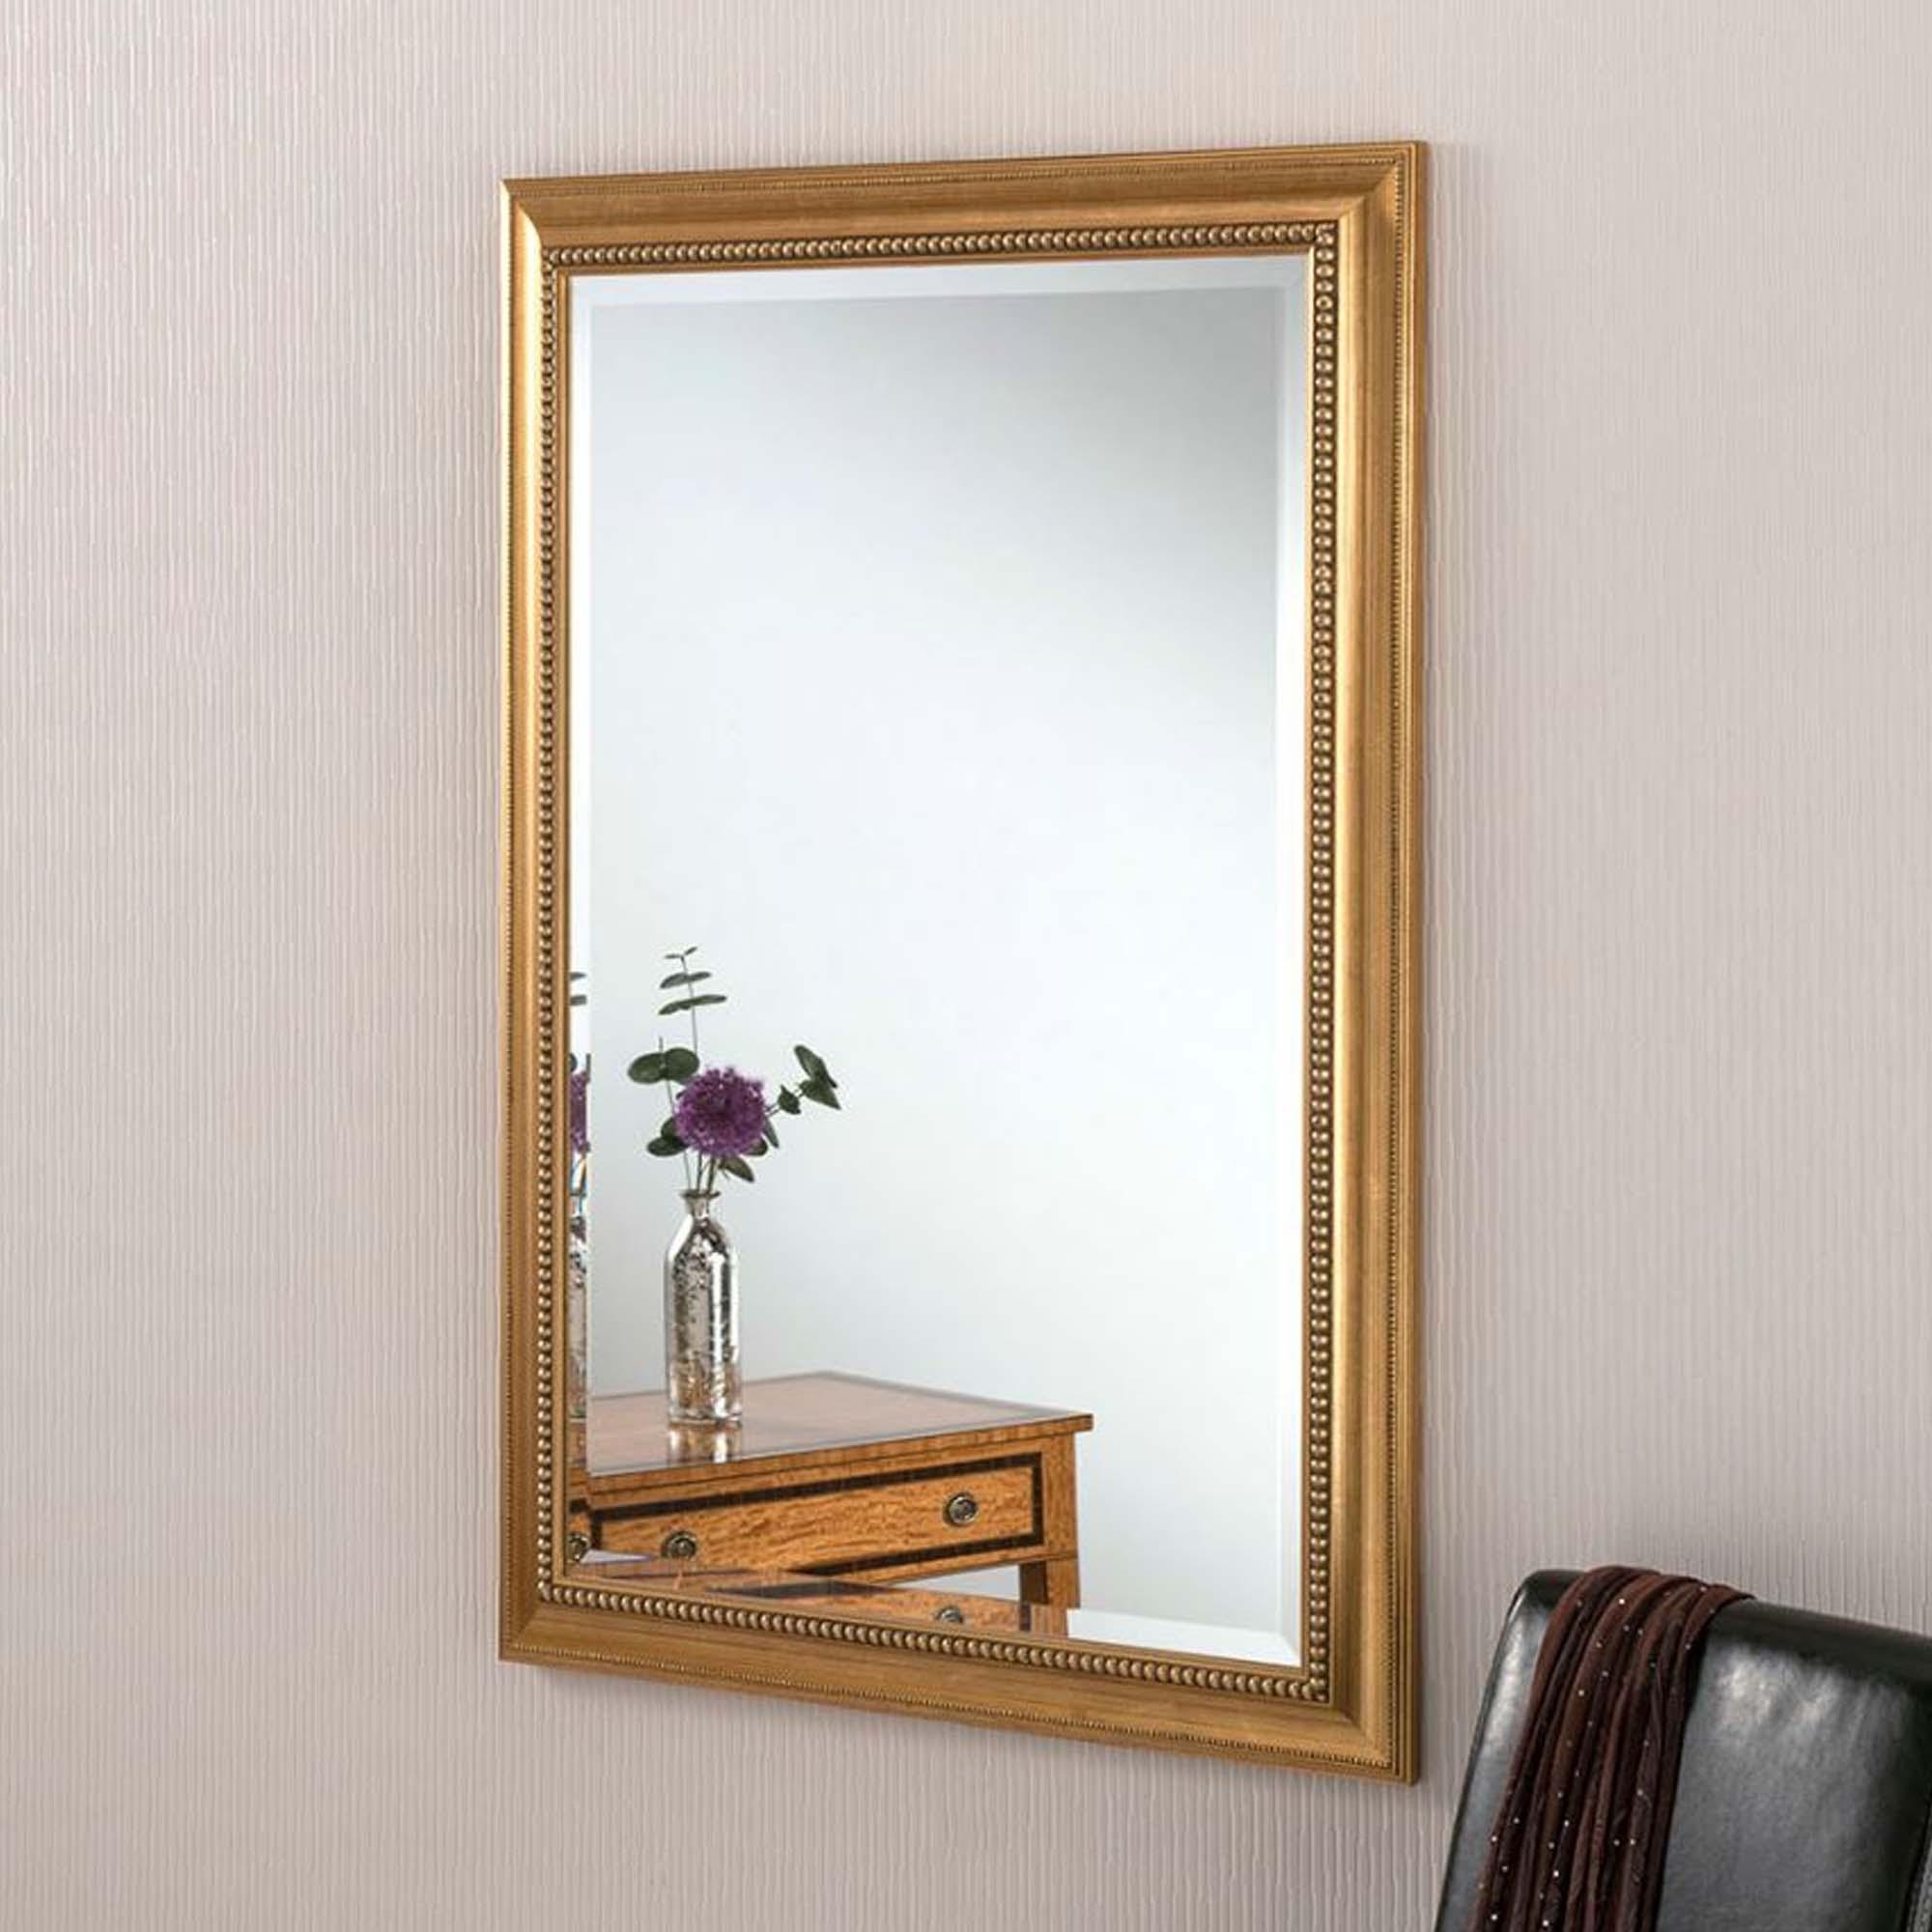 Beaded Wall Mirrors Regarding 2020 Ornate Gold Beaded Rectangular Wall Mirror (View 13 of 20)